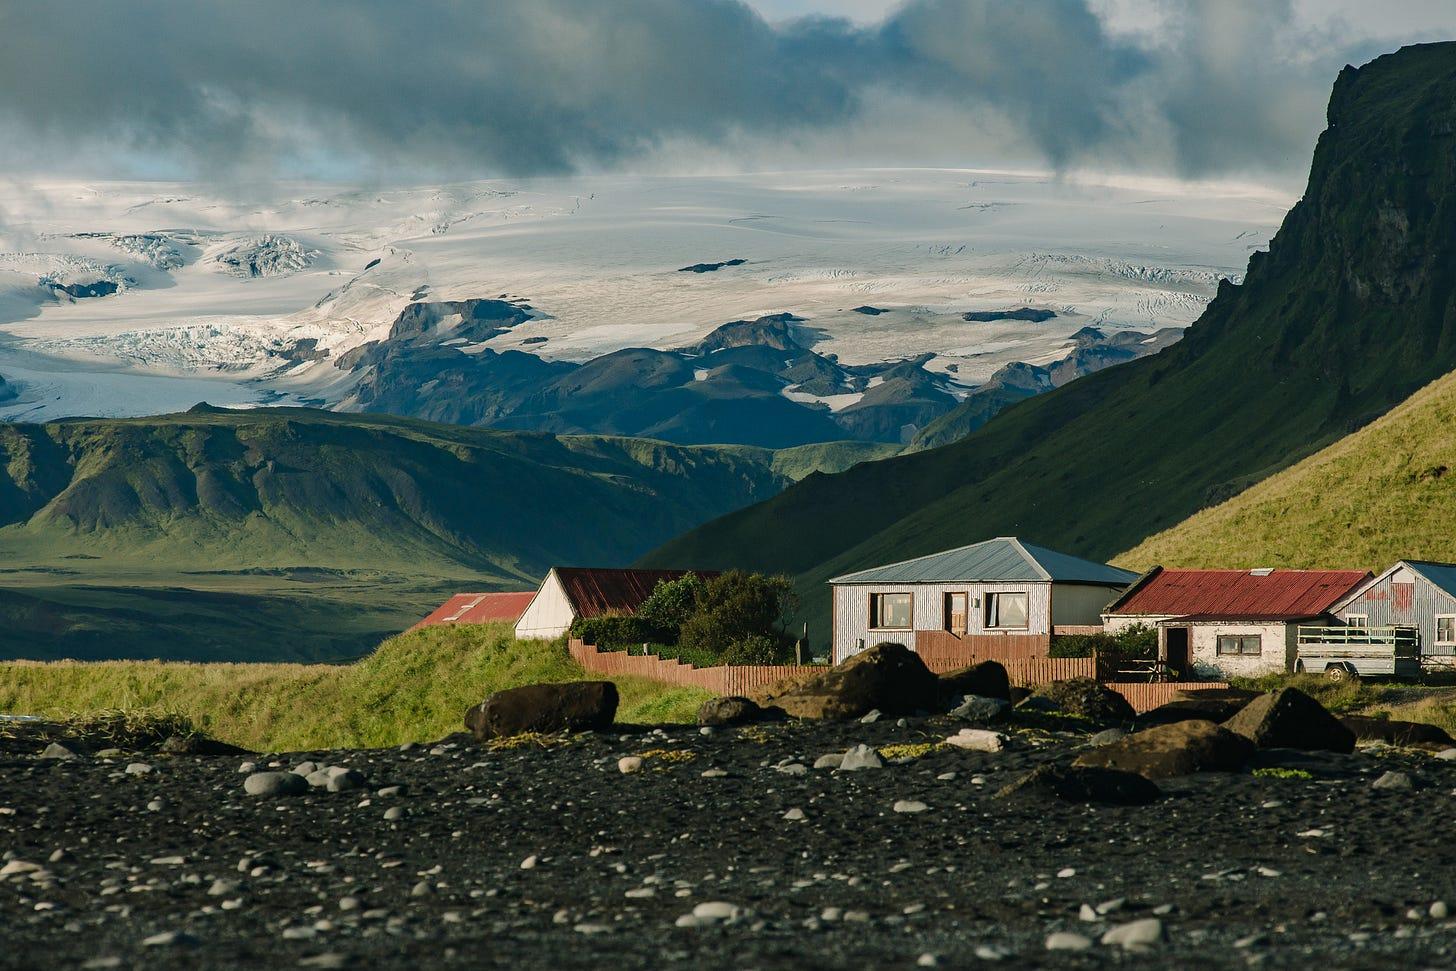 19-iceland-5000-pete-carr.jpg